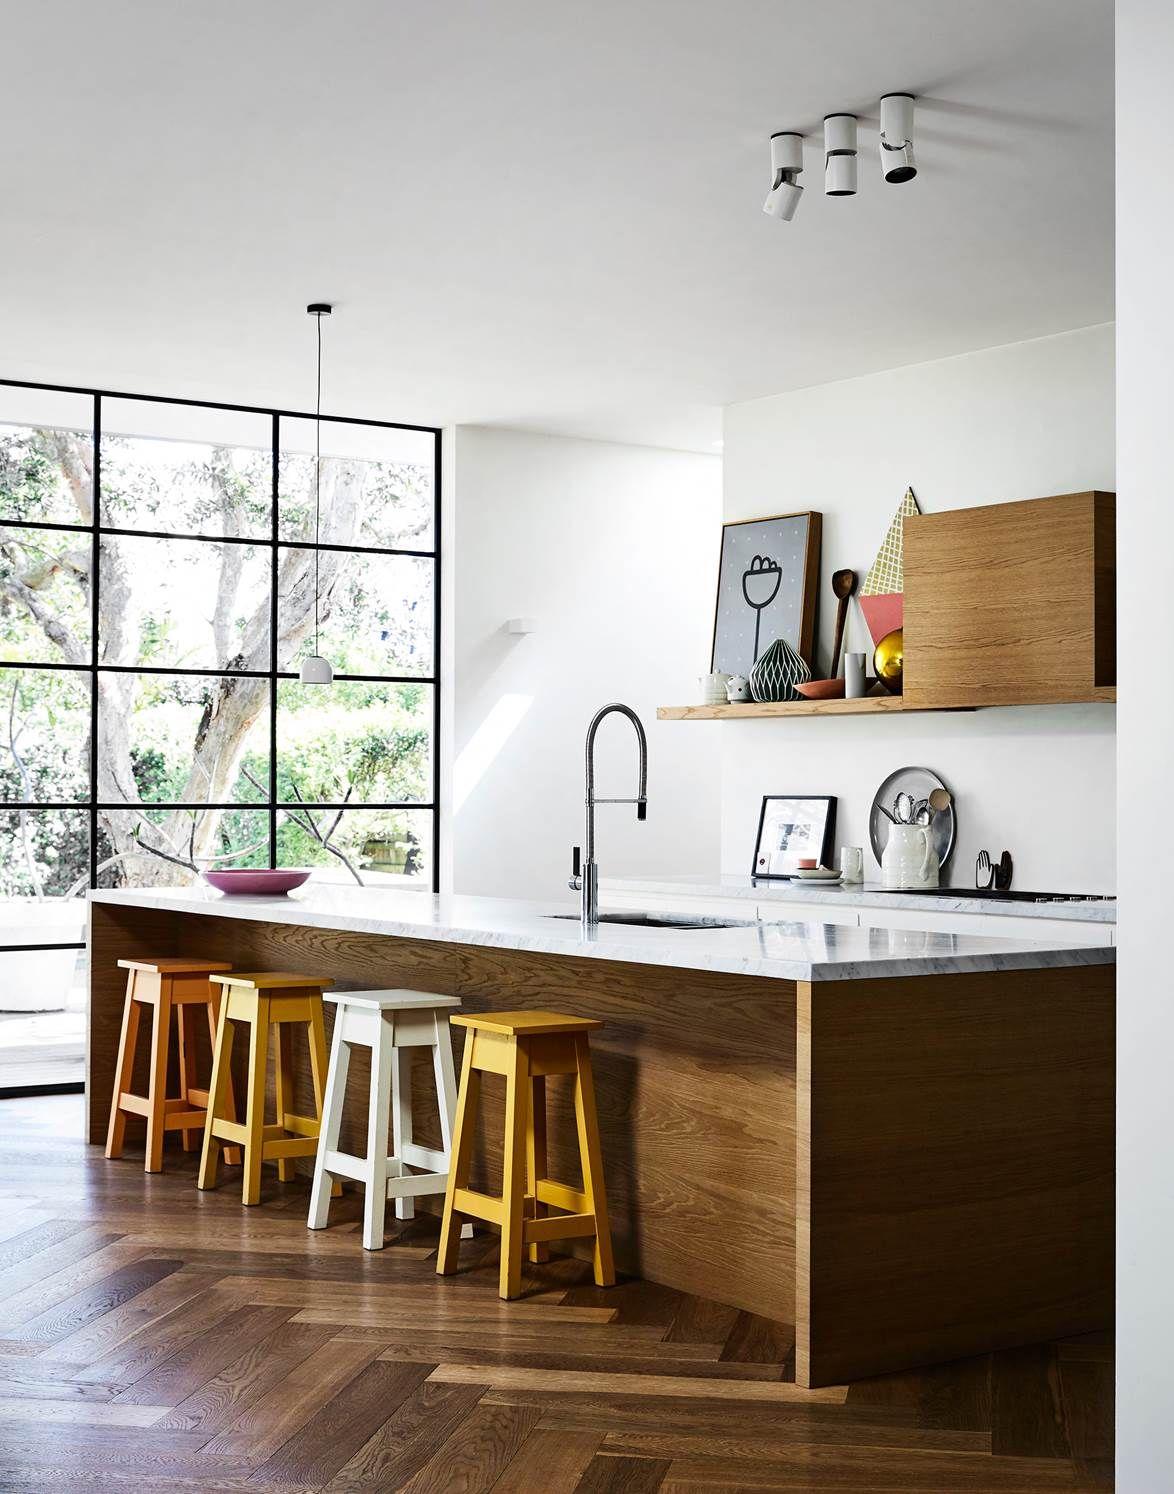 Ideen für küchenideen the bold and beautiful home of rachel castle u minoo  interior